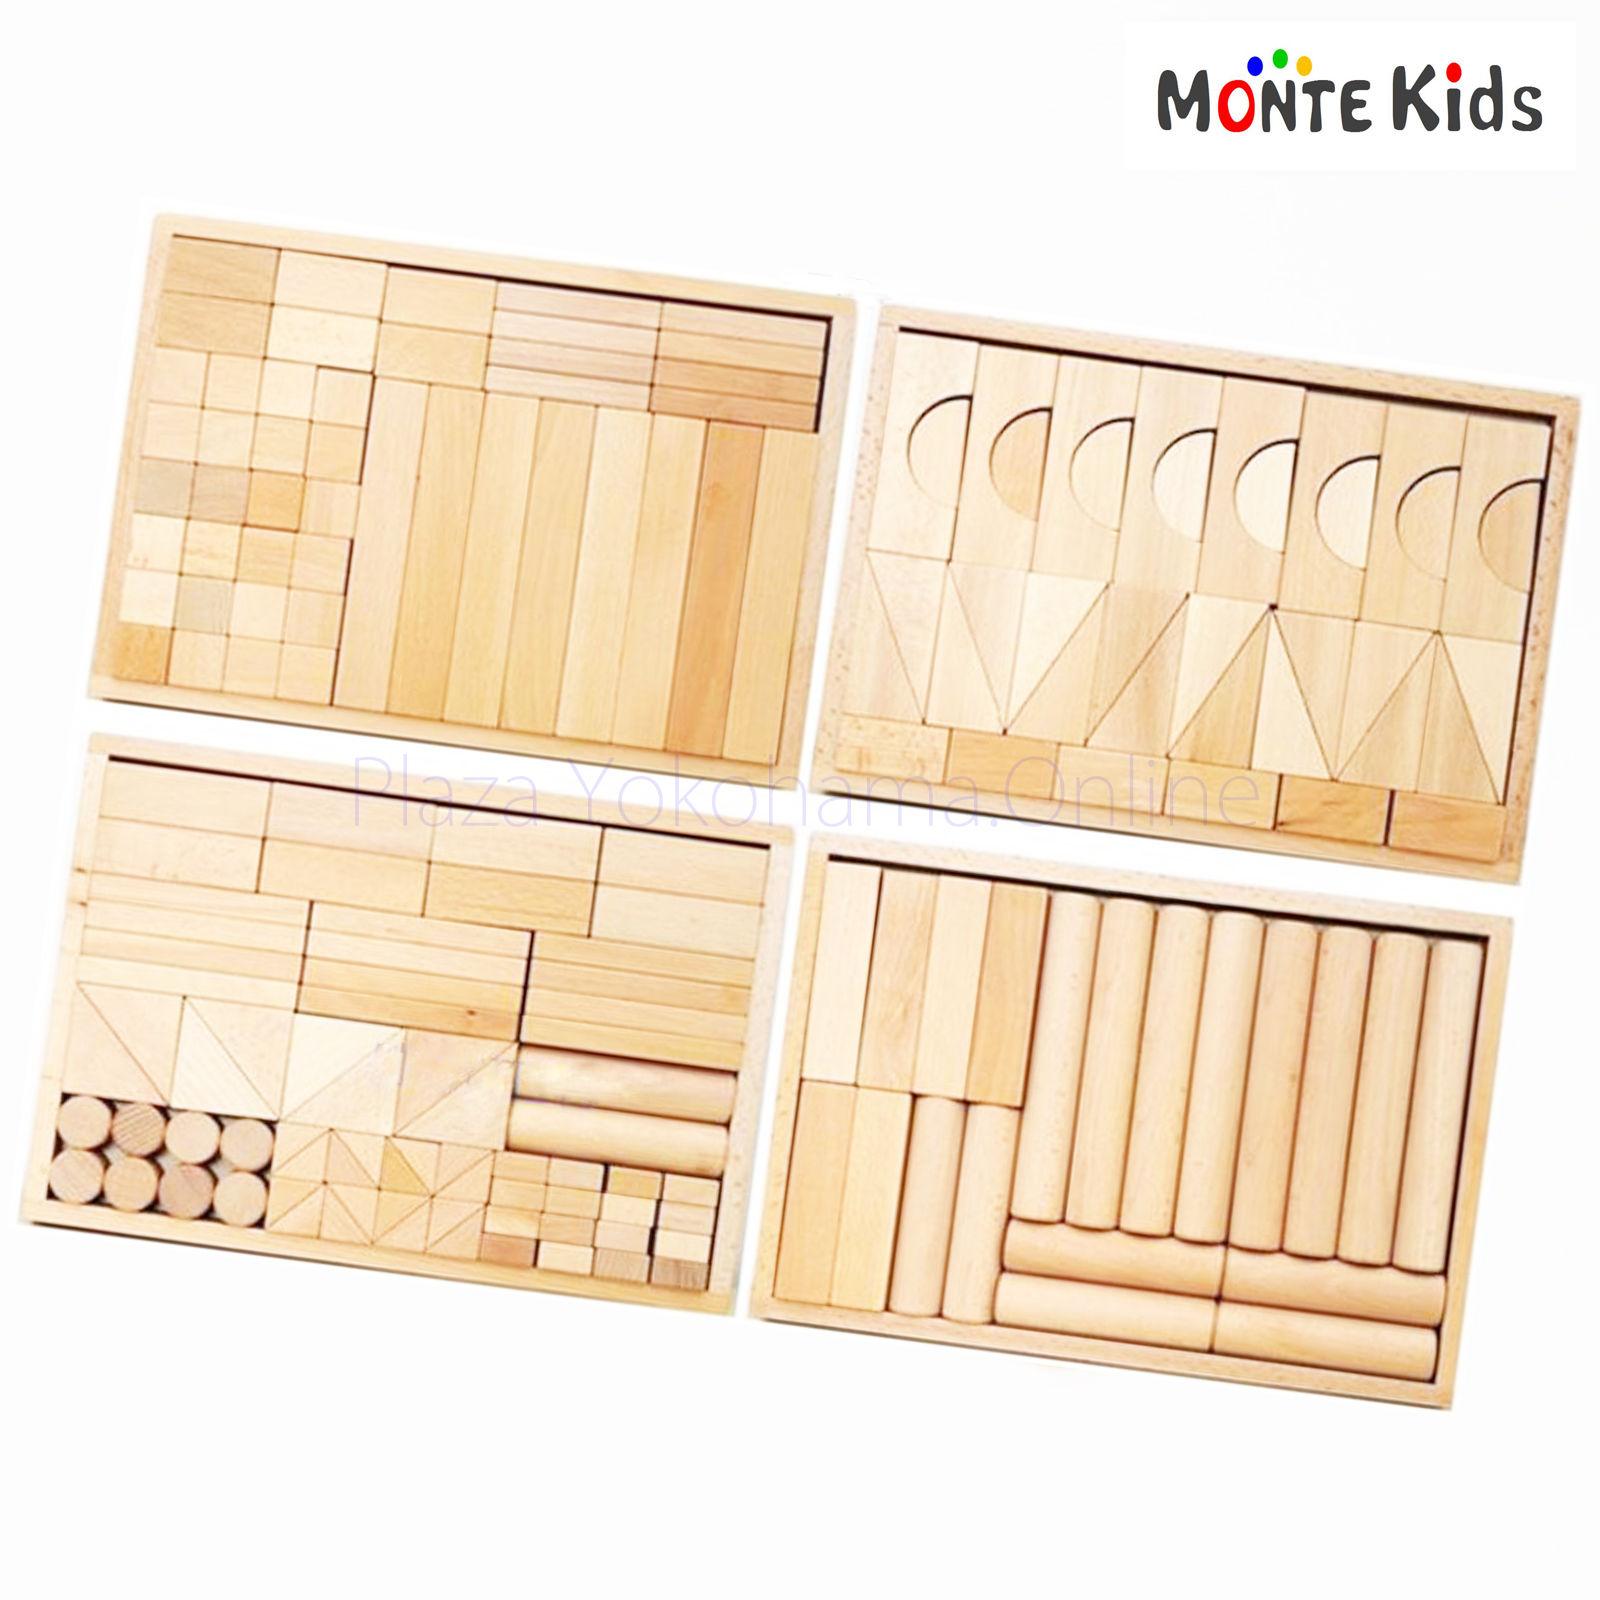 【MONTE Kids】MK-055  180ピース 4段 無垢 積み木セット